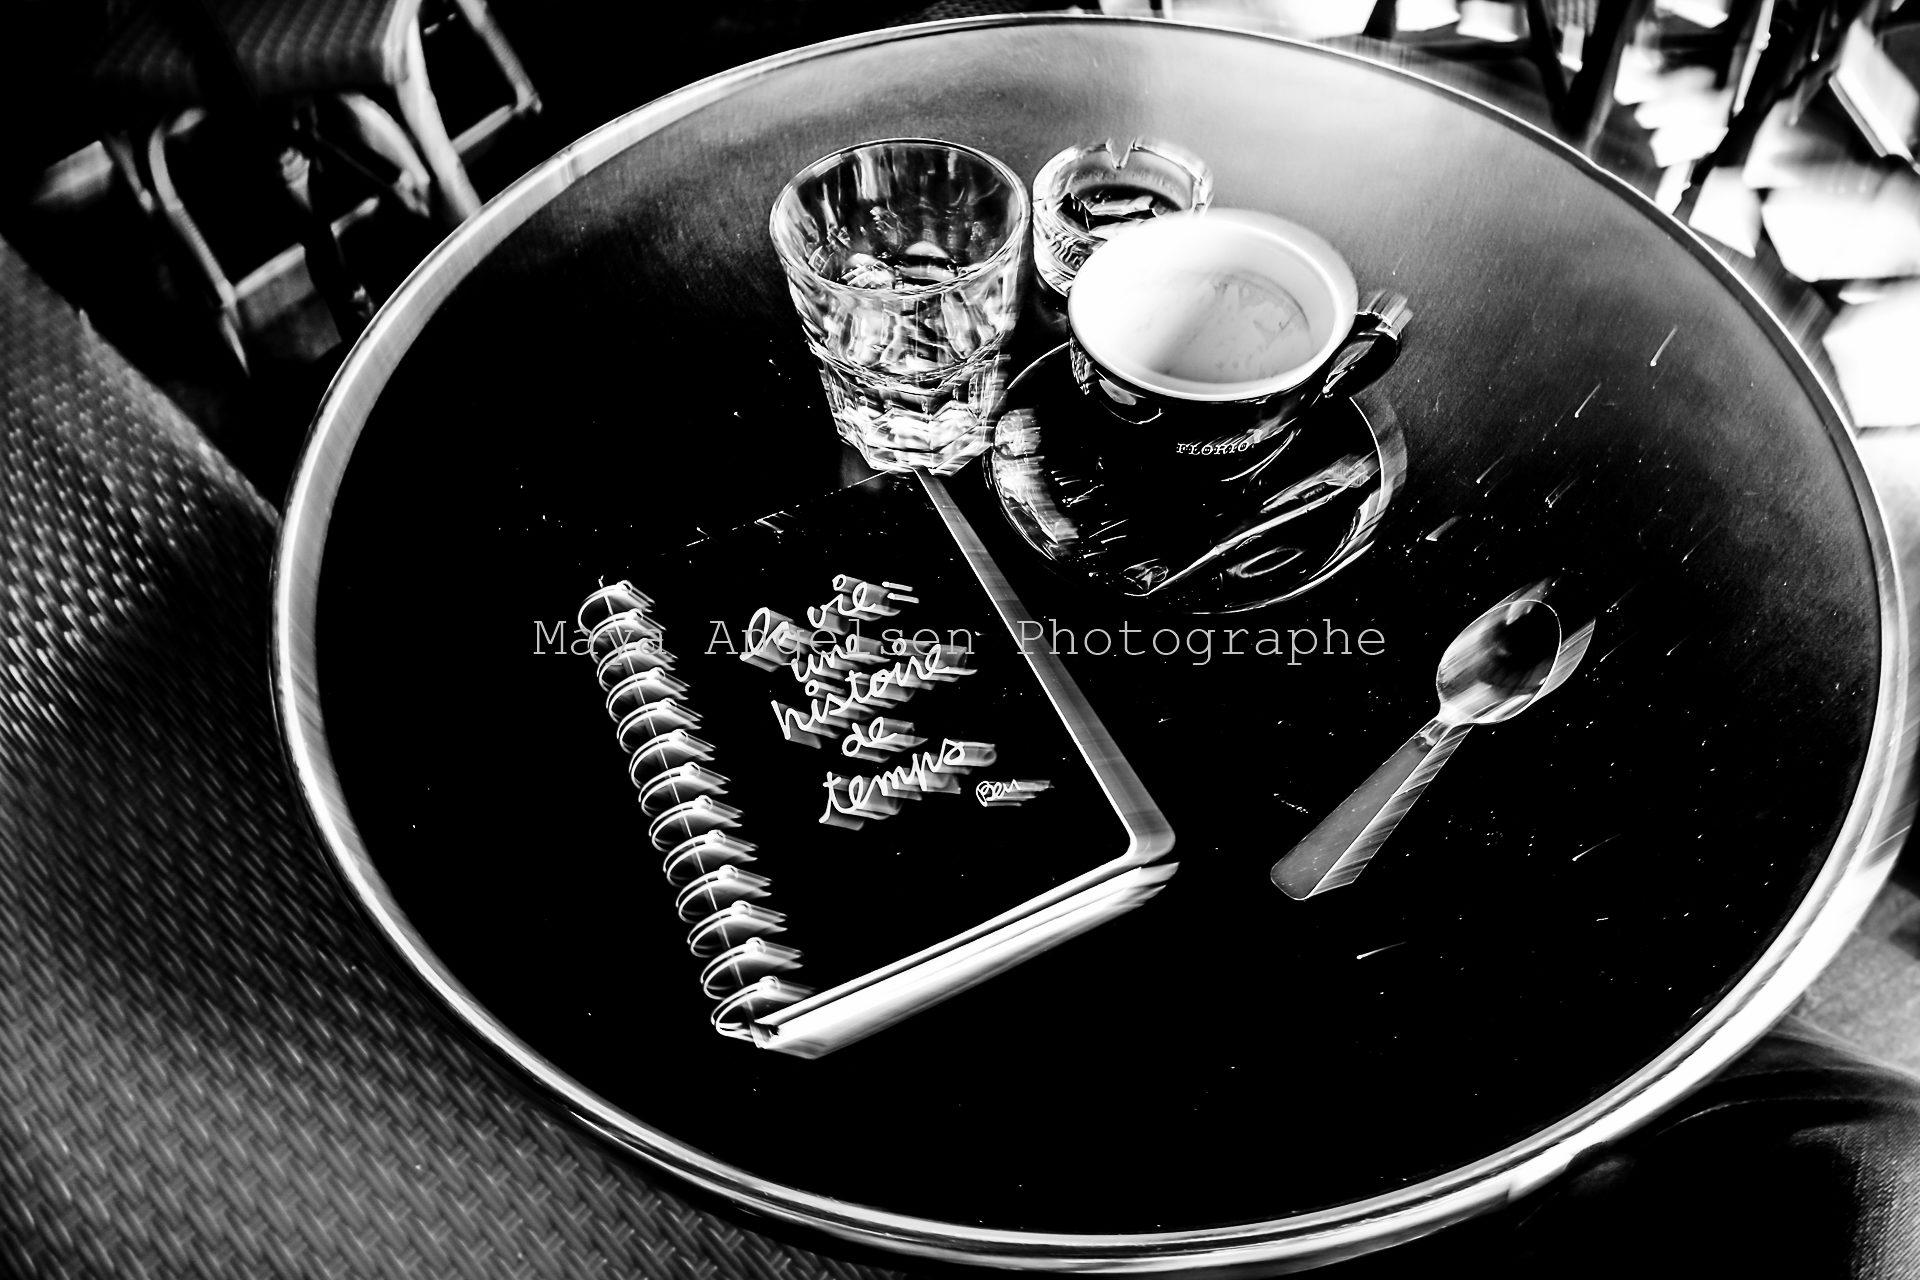 Photographe-Streetphoto-Maya-Angelsen-cafe-serre